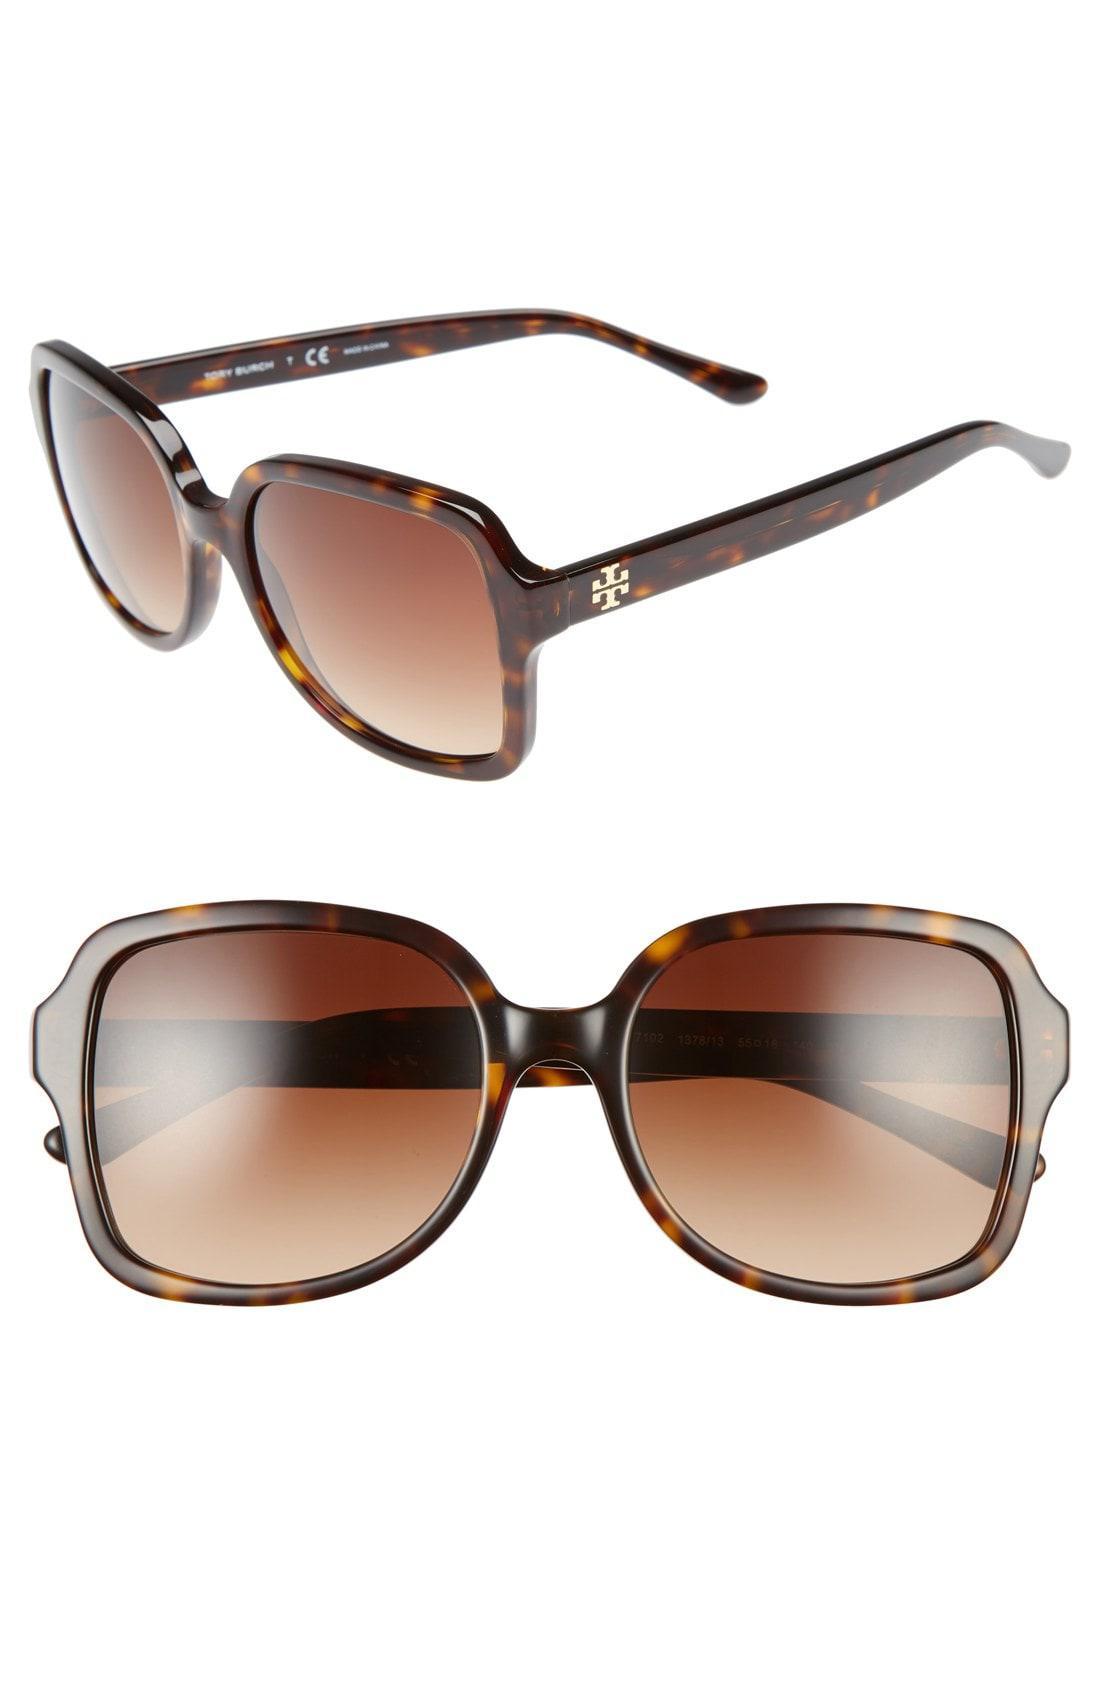 64dd4f8abde64 Lyst - Tory Burch 55mm Square Sunglasses - Dark Tortoise in Brown ...